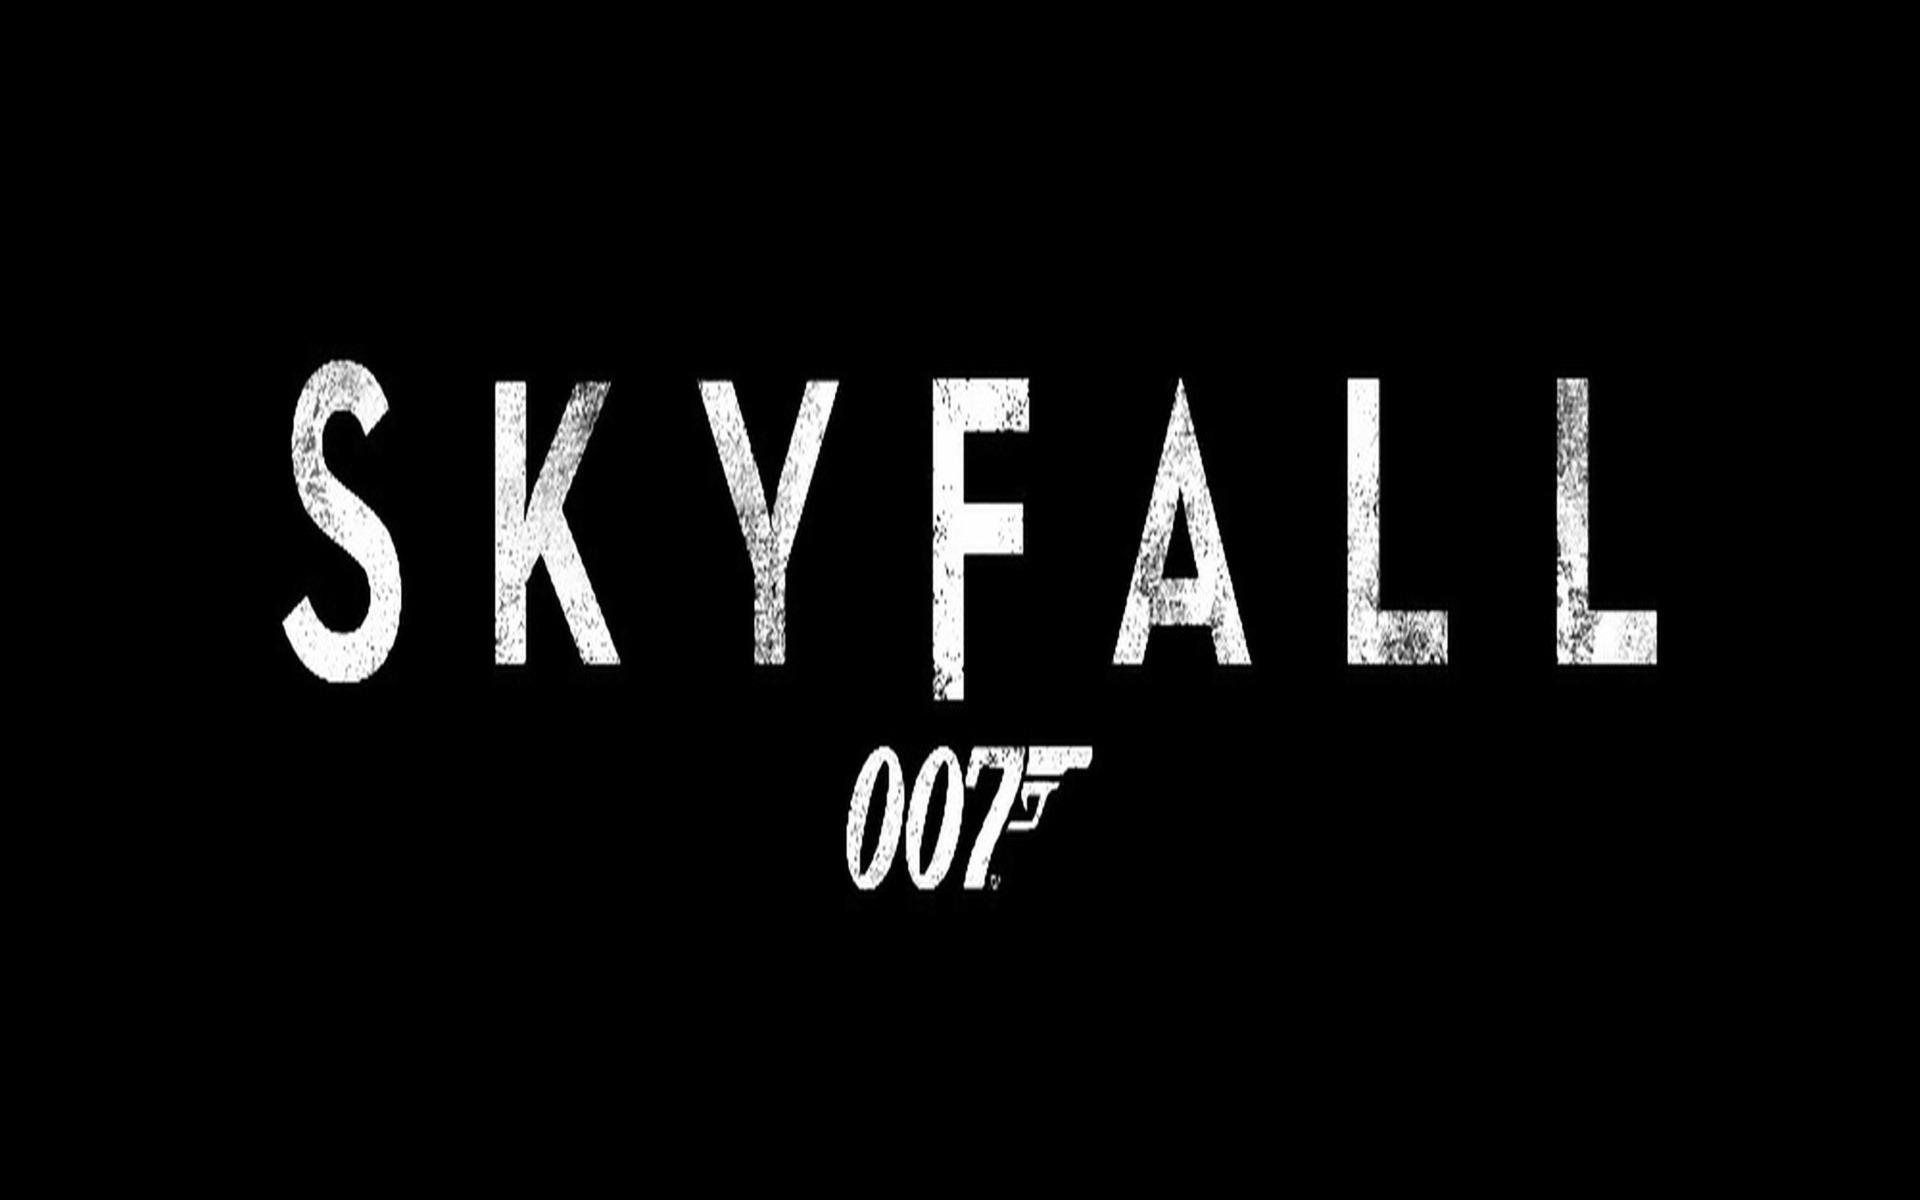 007 Skyfall 2012 Movie Hd Desktop Wallpapers 18 1920x1200 Wallpaper